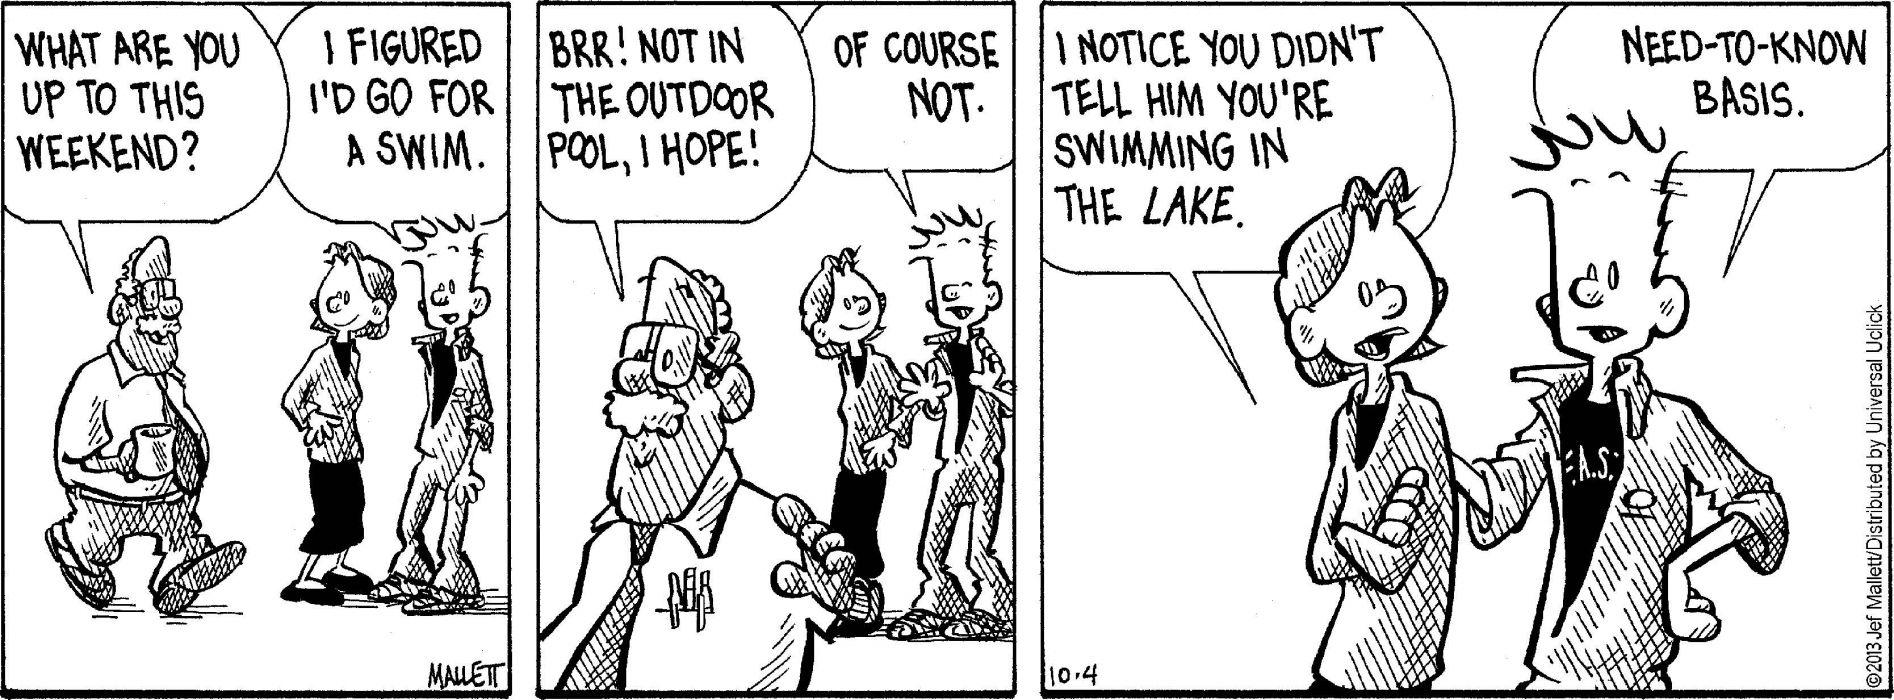 FRAZZ comicstrip humor funny comic (16) wallpaper